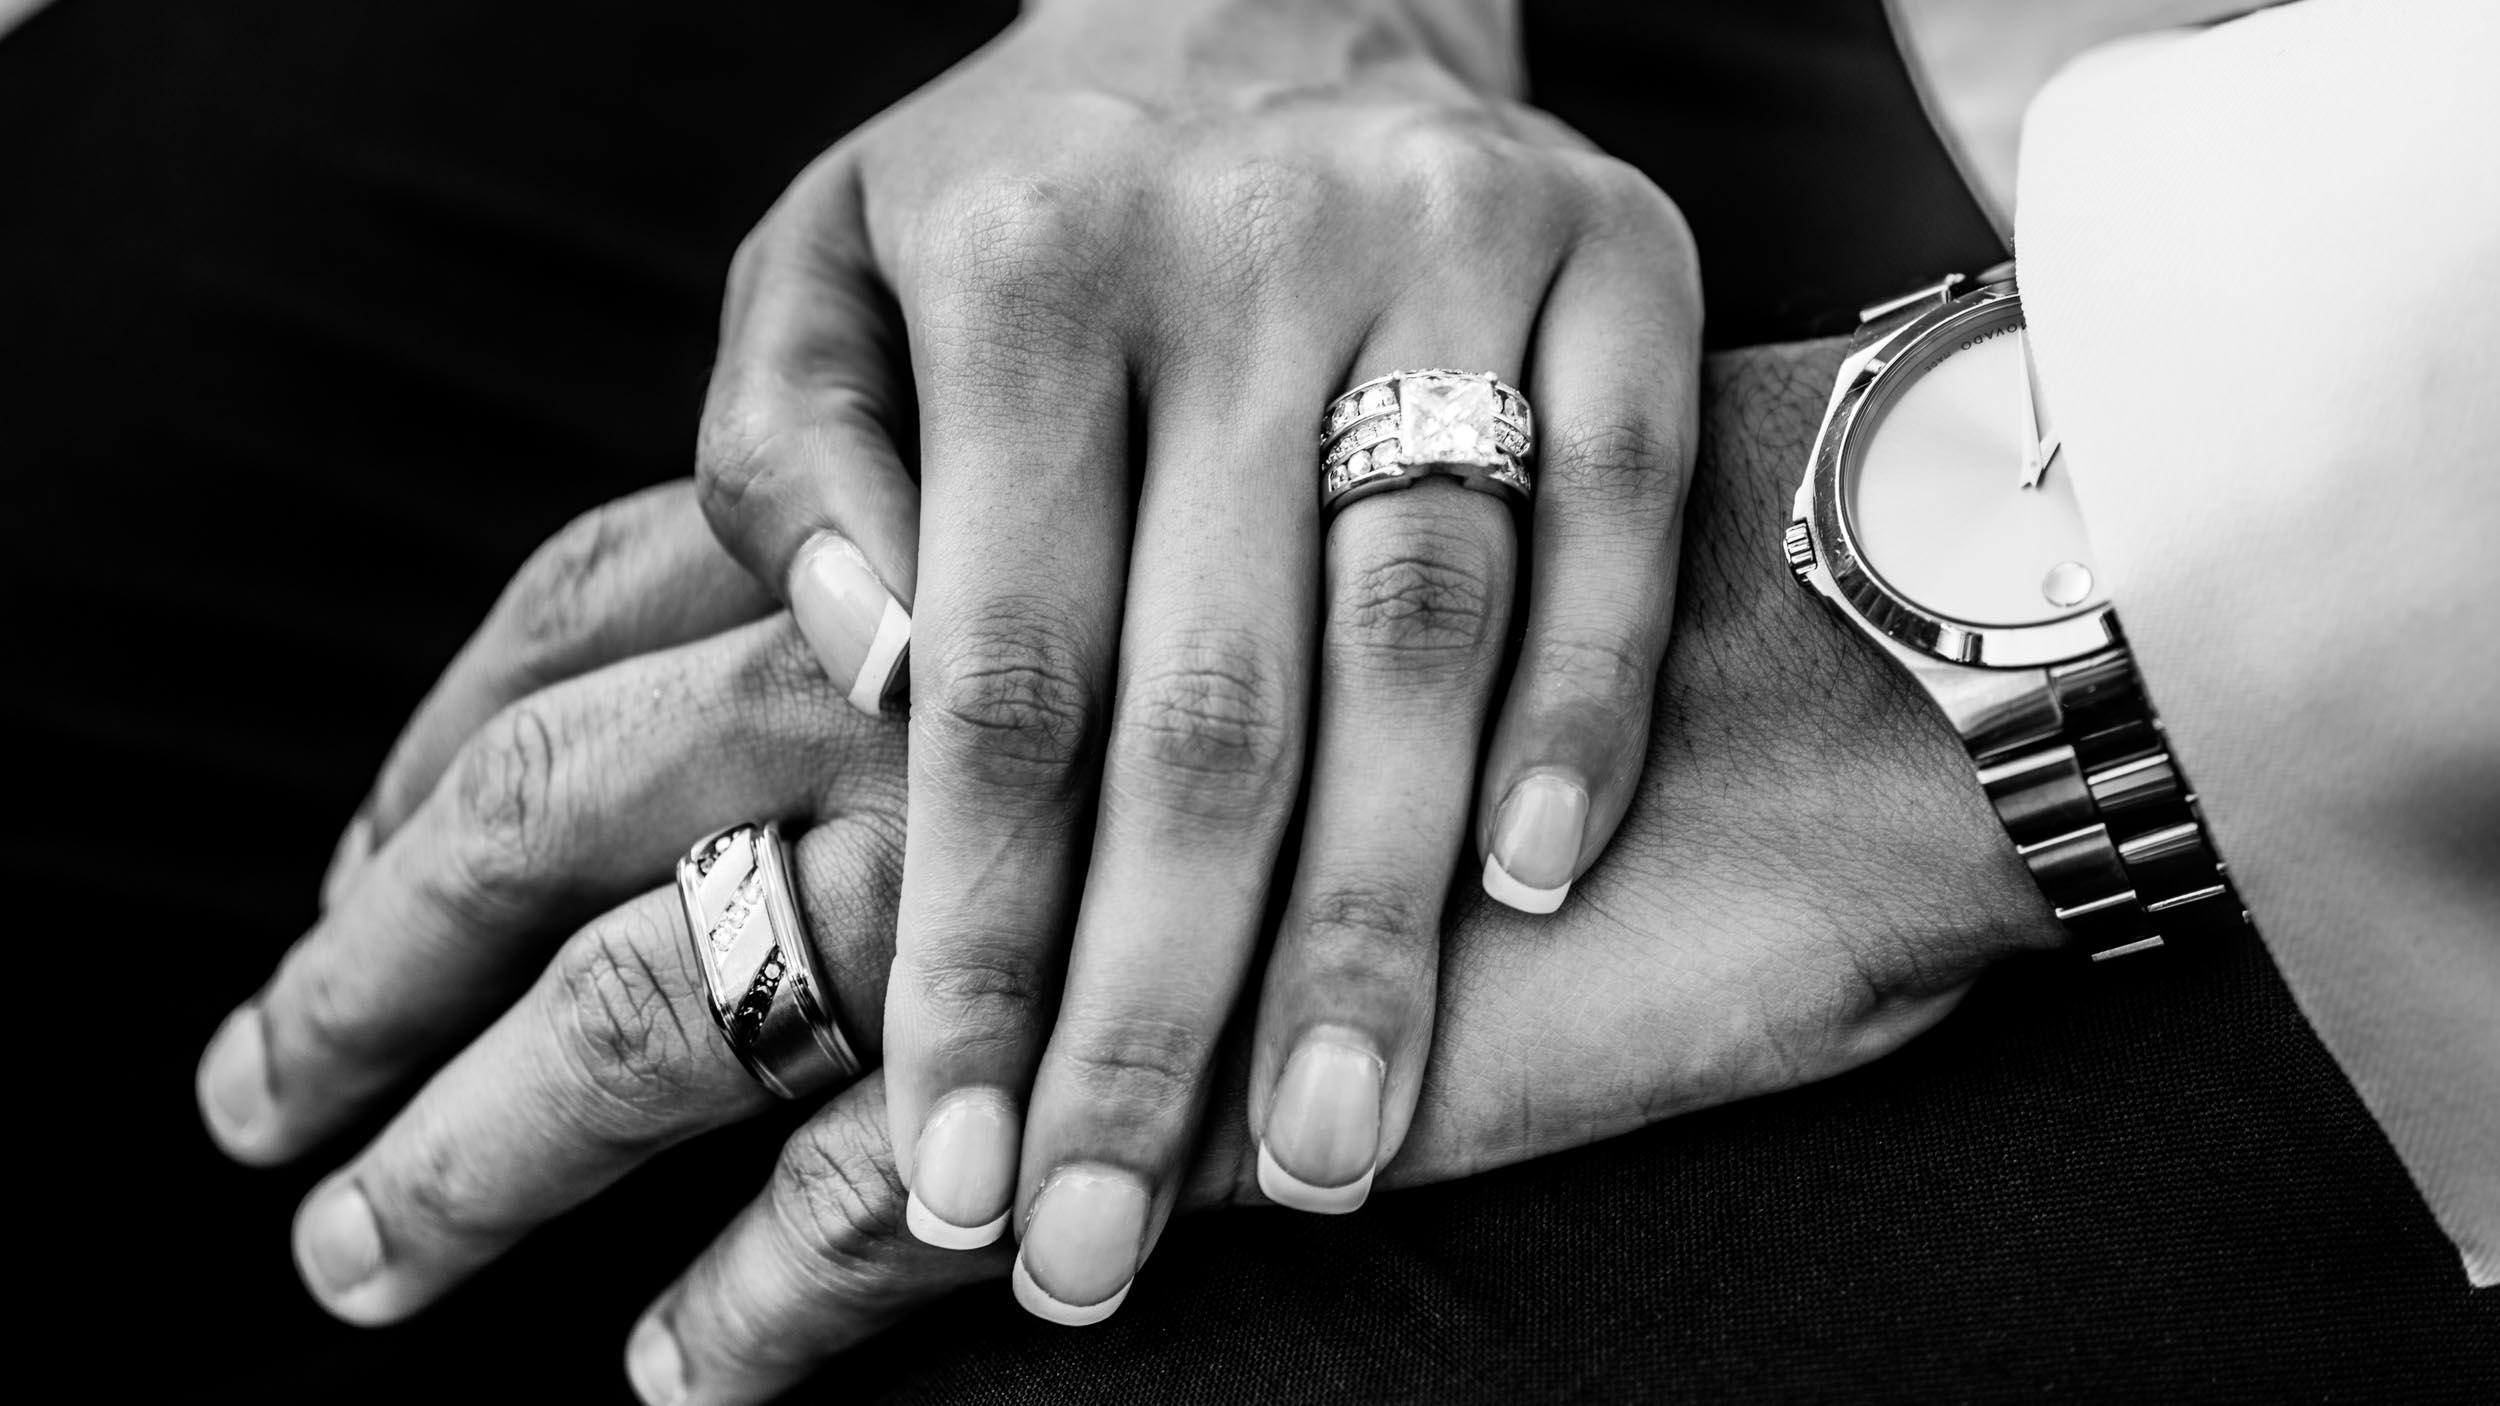 dc+metro+wedding+photographer+vadym+guliuk+photography+wedding+rings-2026.jpg